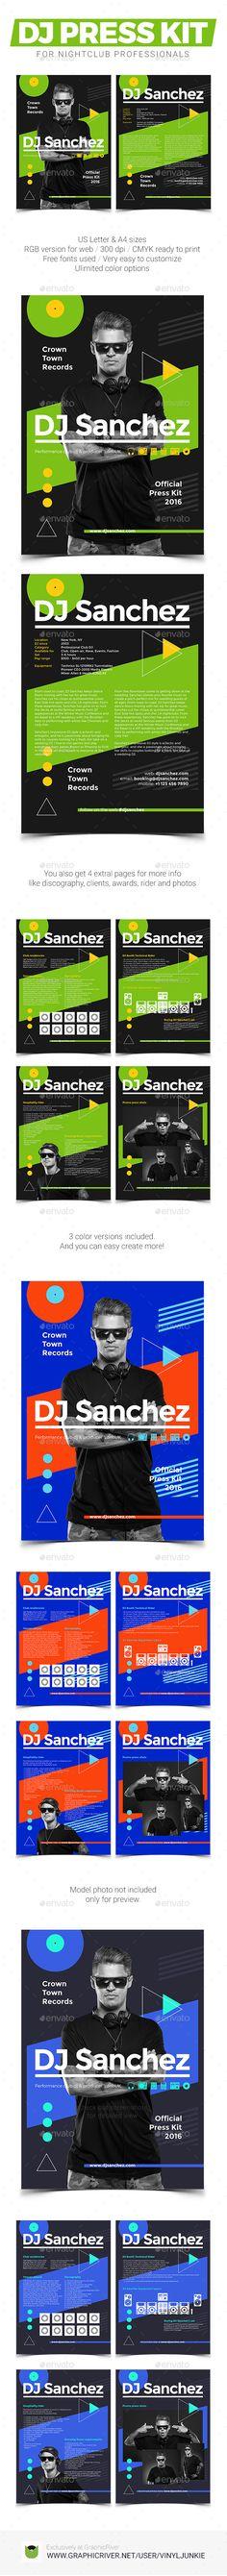 ProDJ - DJ Press Kit / DJ Resume / DJ Rider PSD Template Press